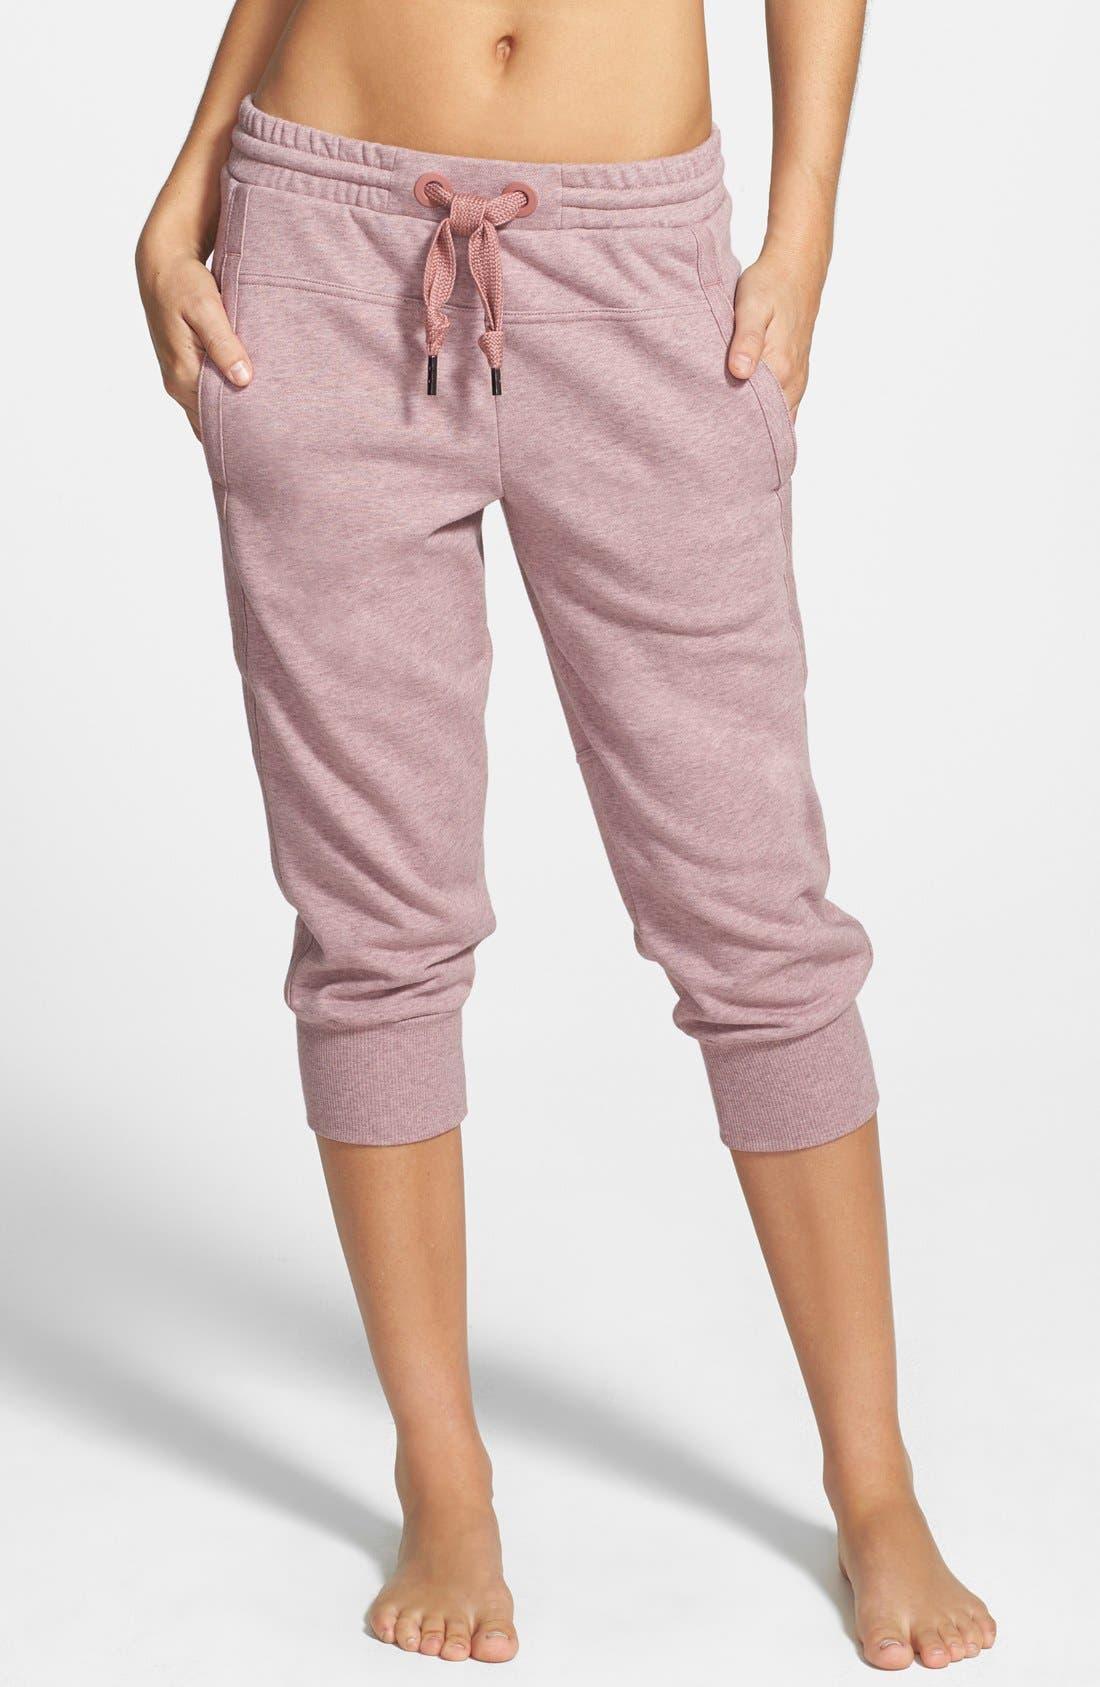 Alternate Image 1 Selected - adidas by Stella McCartney 'Essentials' Capris Sweatpants